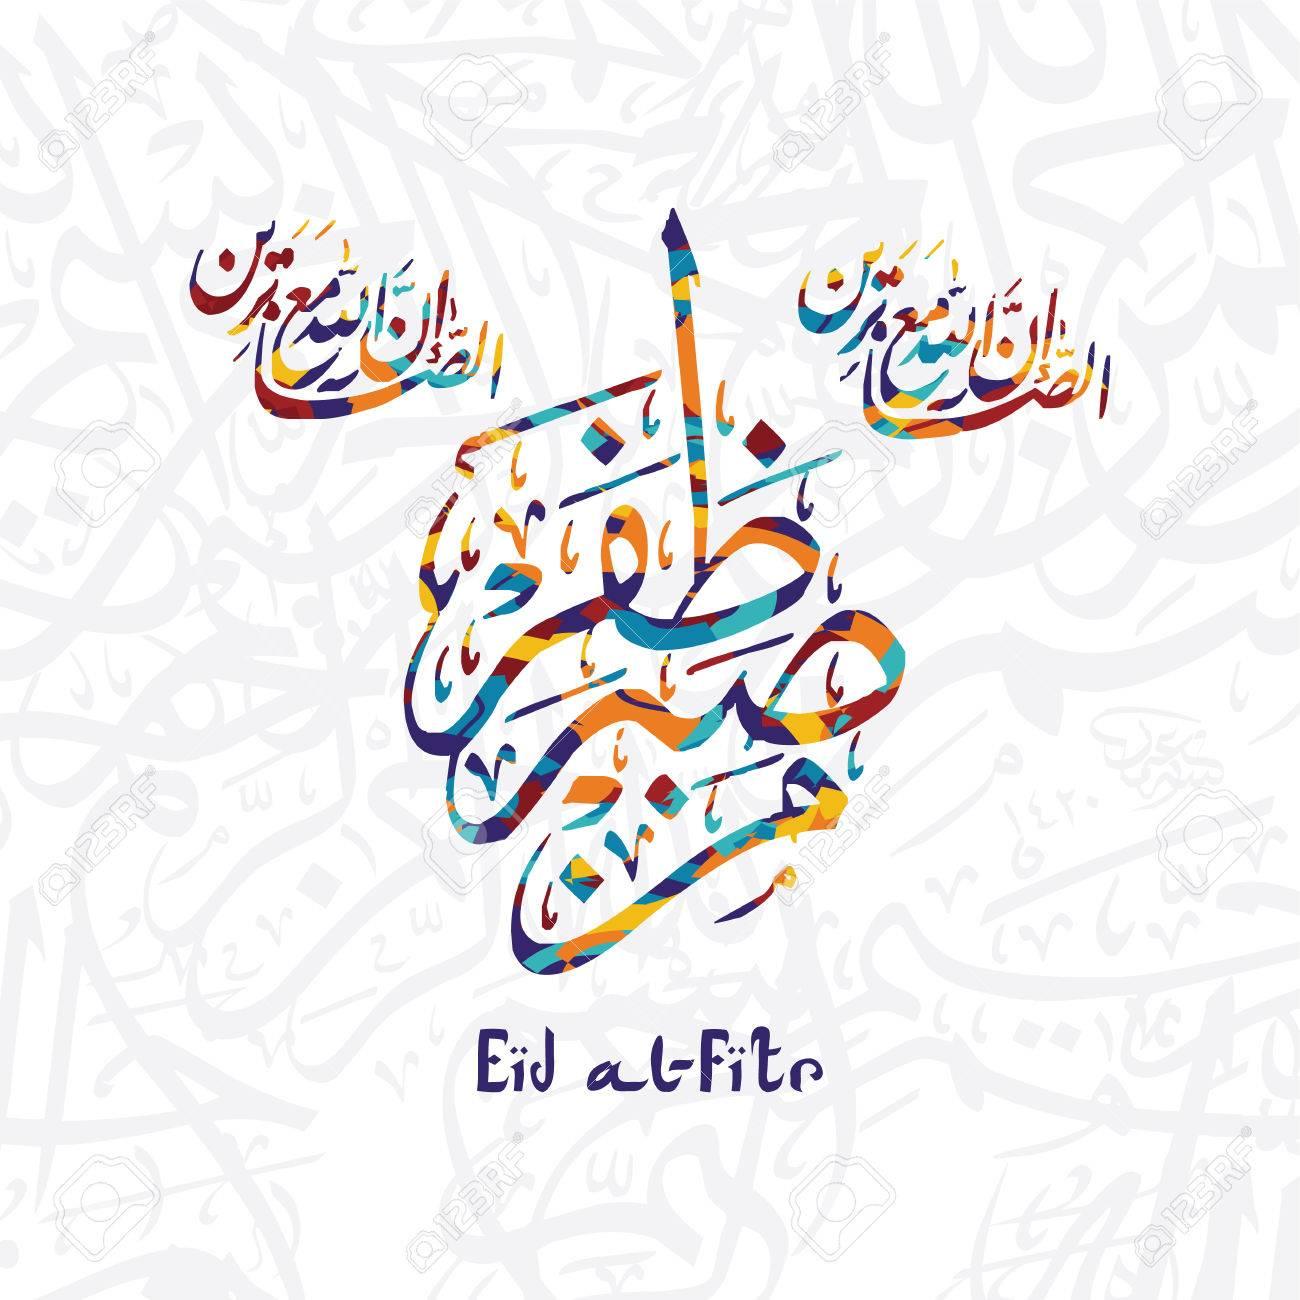 Happy eid mubarak greetings arabic calligraphy art theme vector happy eid mubarak greetings arabic calligraphy art theme vector illustration stock vector 58160565 m4hsunfo